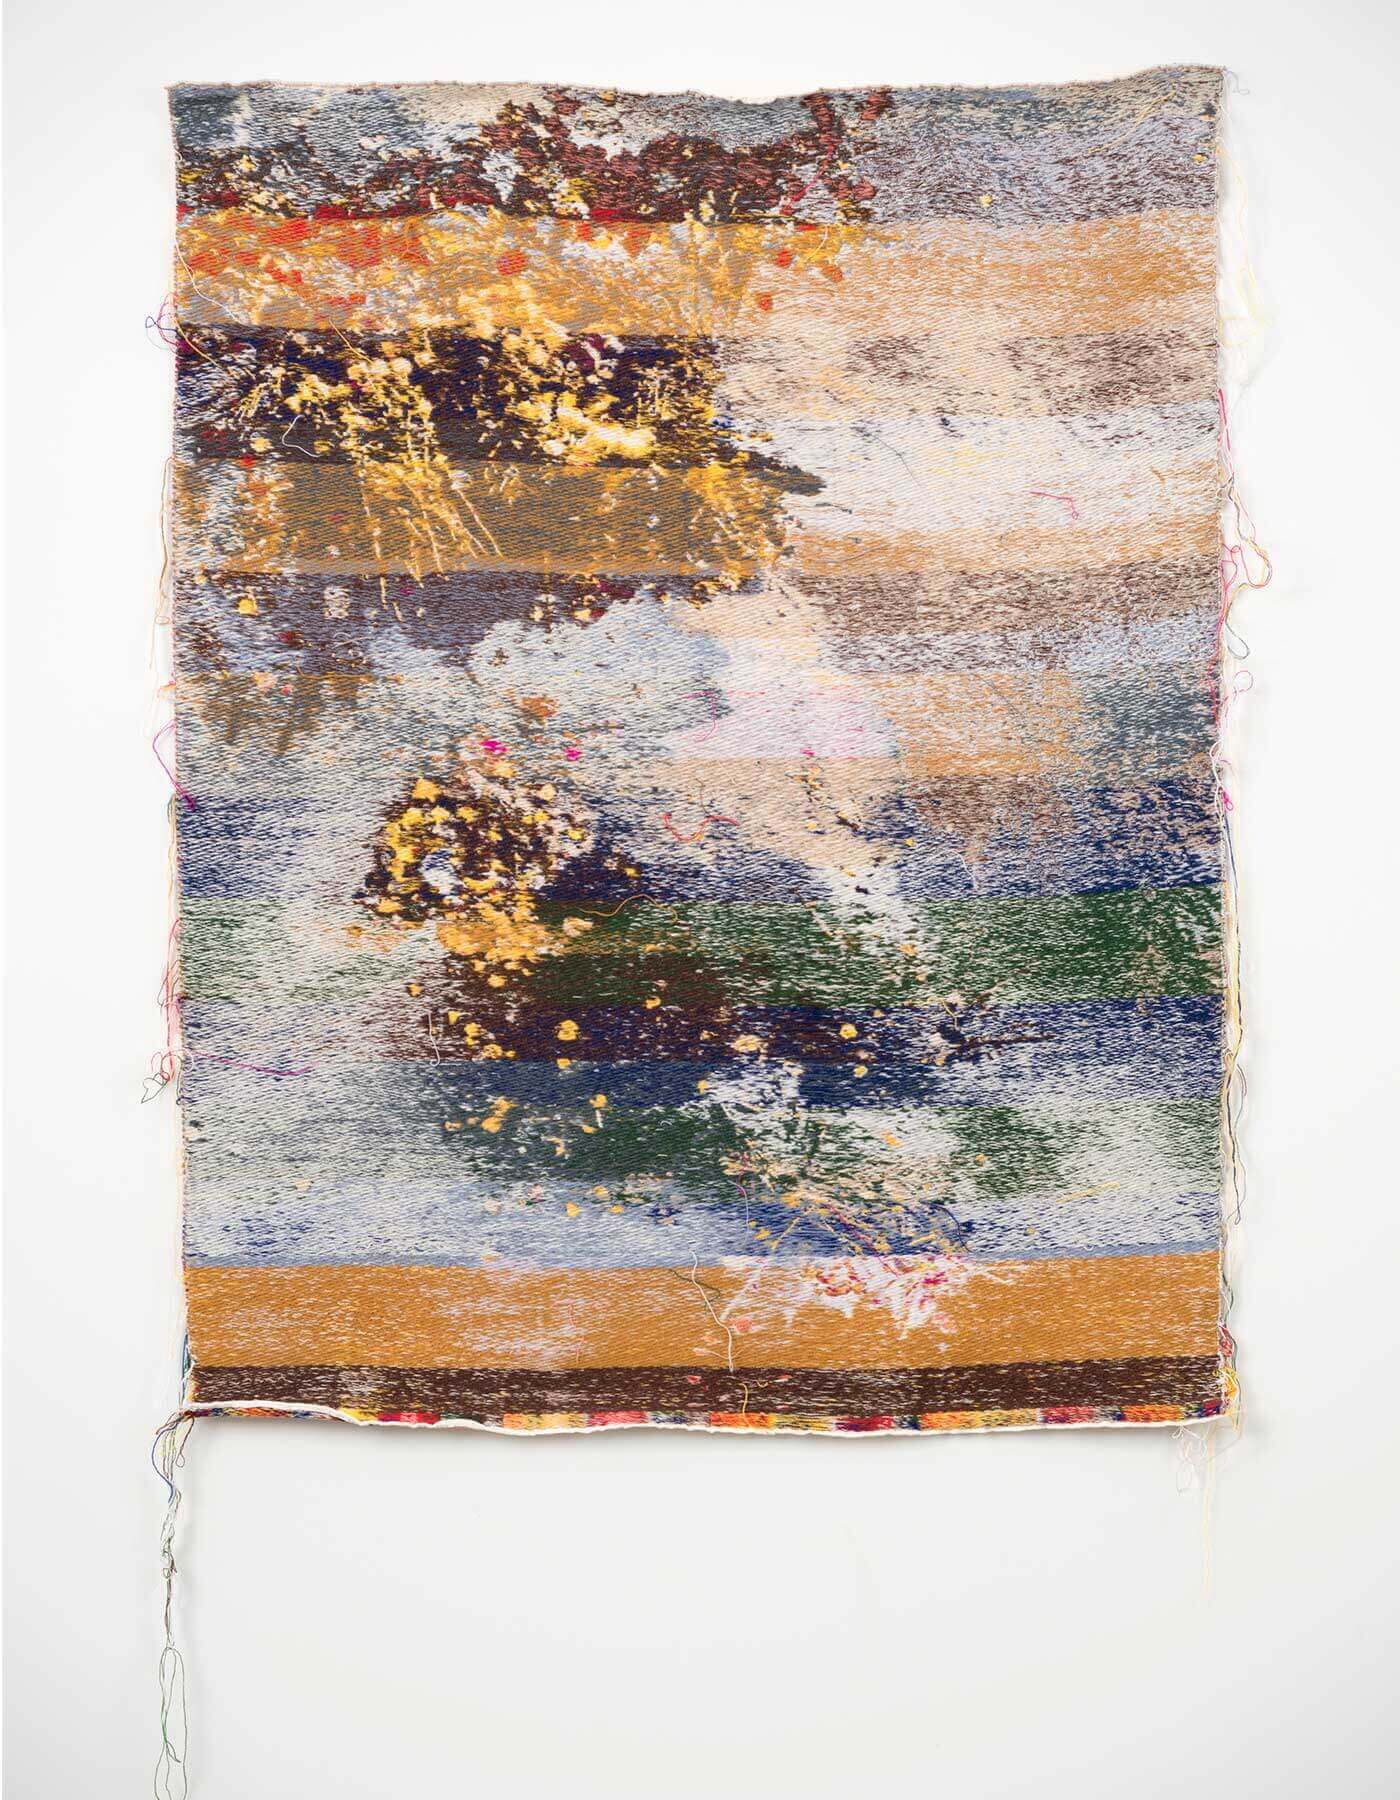 Laura Letinsky & John Paul Morabito |  Indiapilehamletmemajamina - wall tapestry